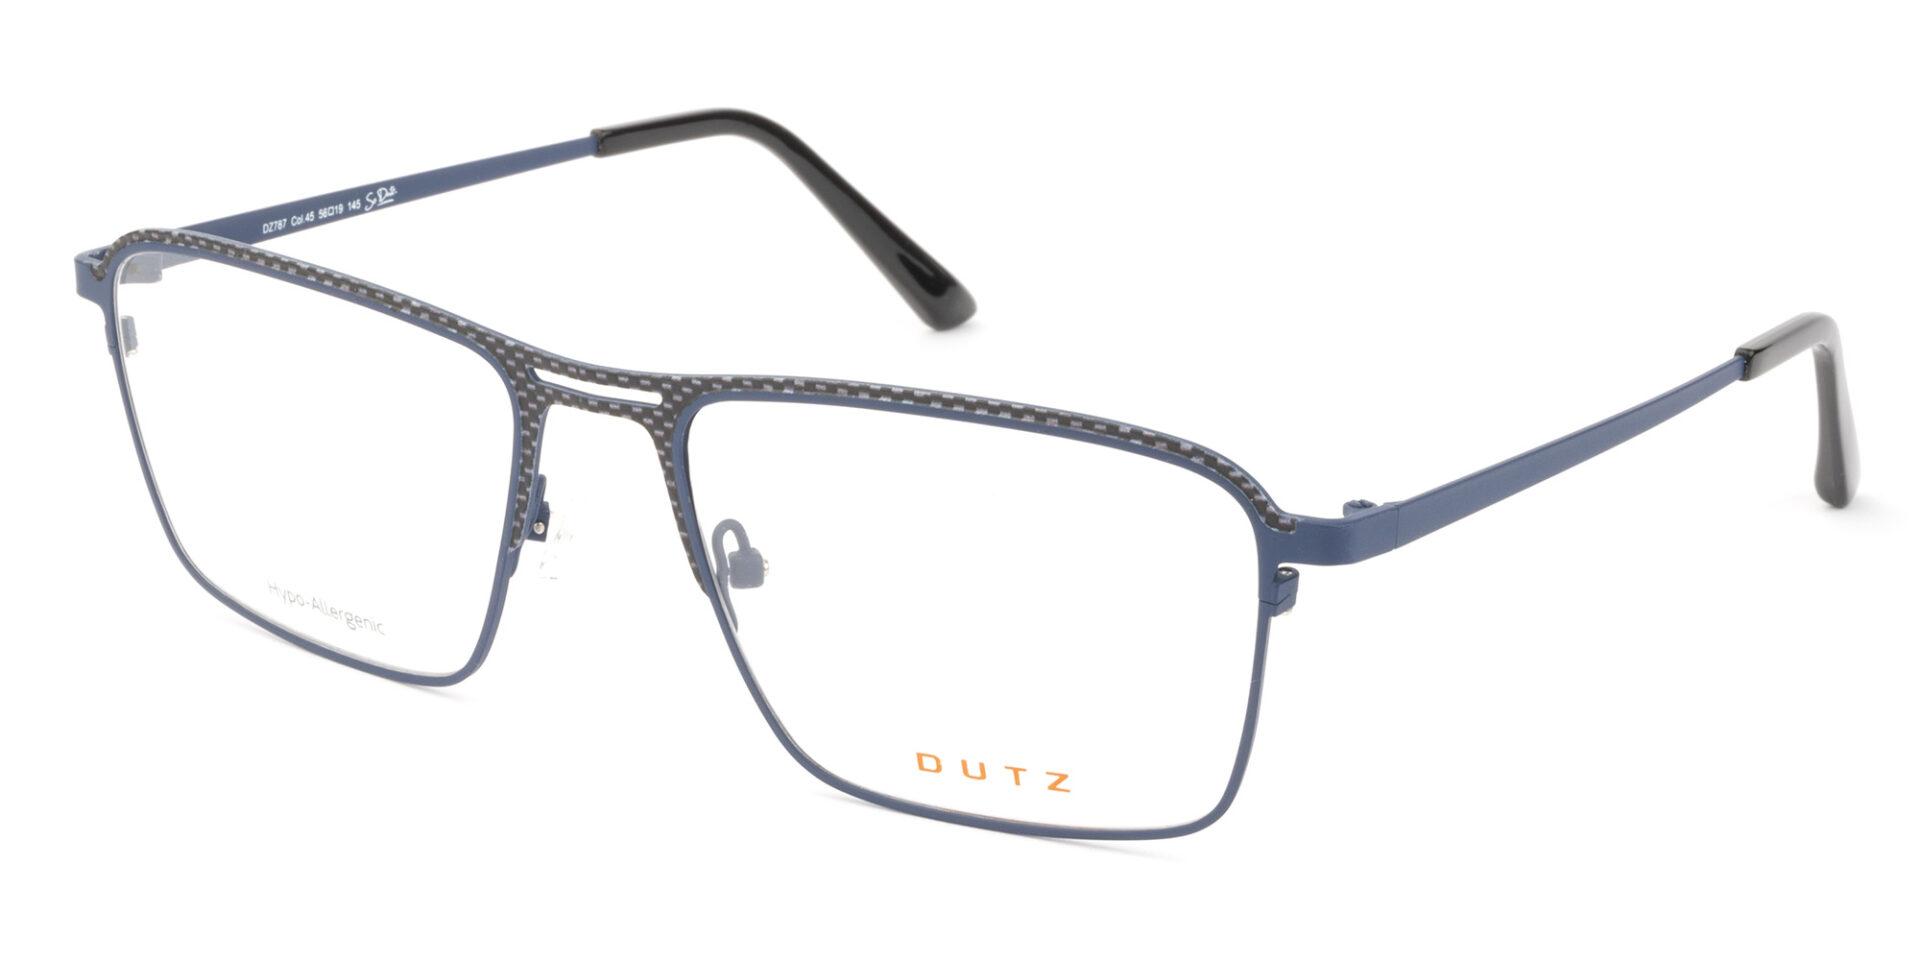 DZ787-45